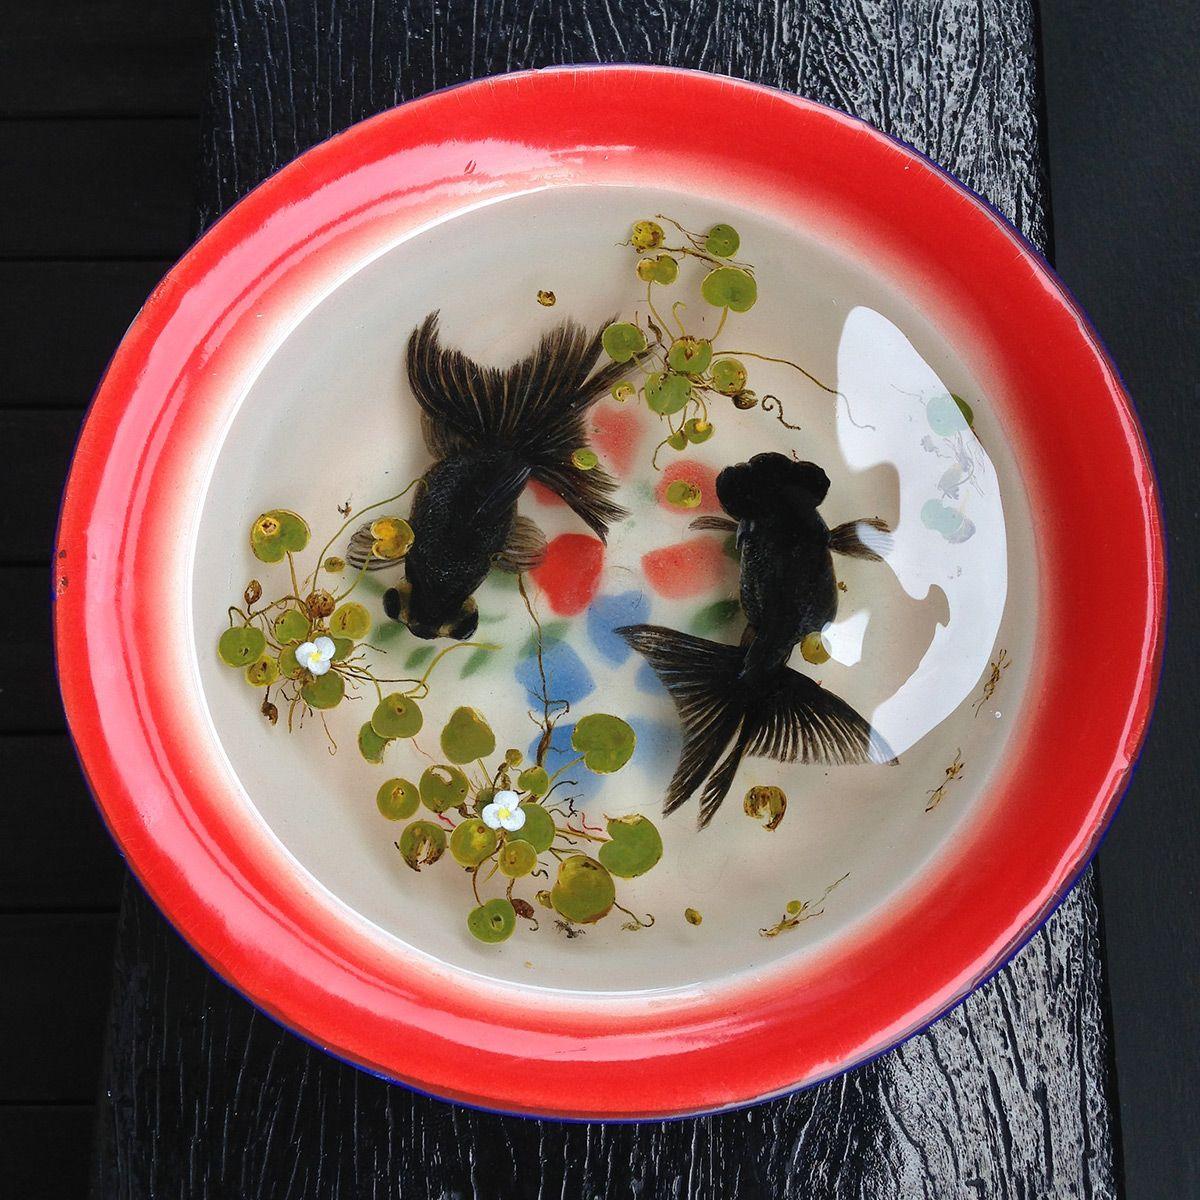 New Aquatic Wildlife Painted In Layers Of Resin By Keng Lye Keng - Incredible 3d goldfish drawings using resin